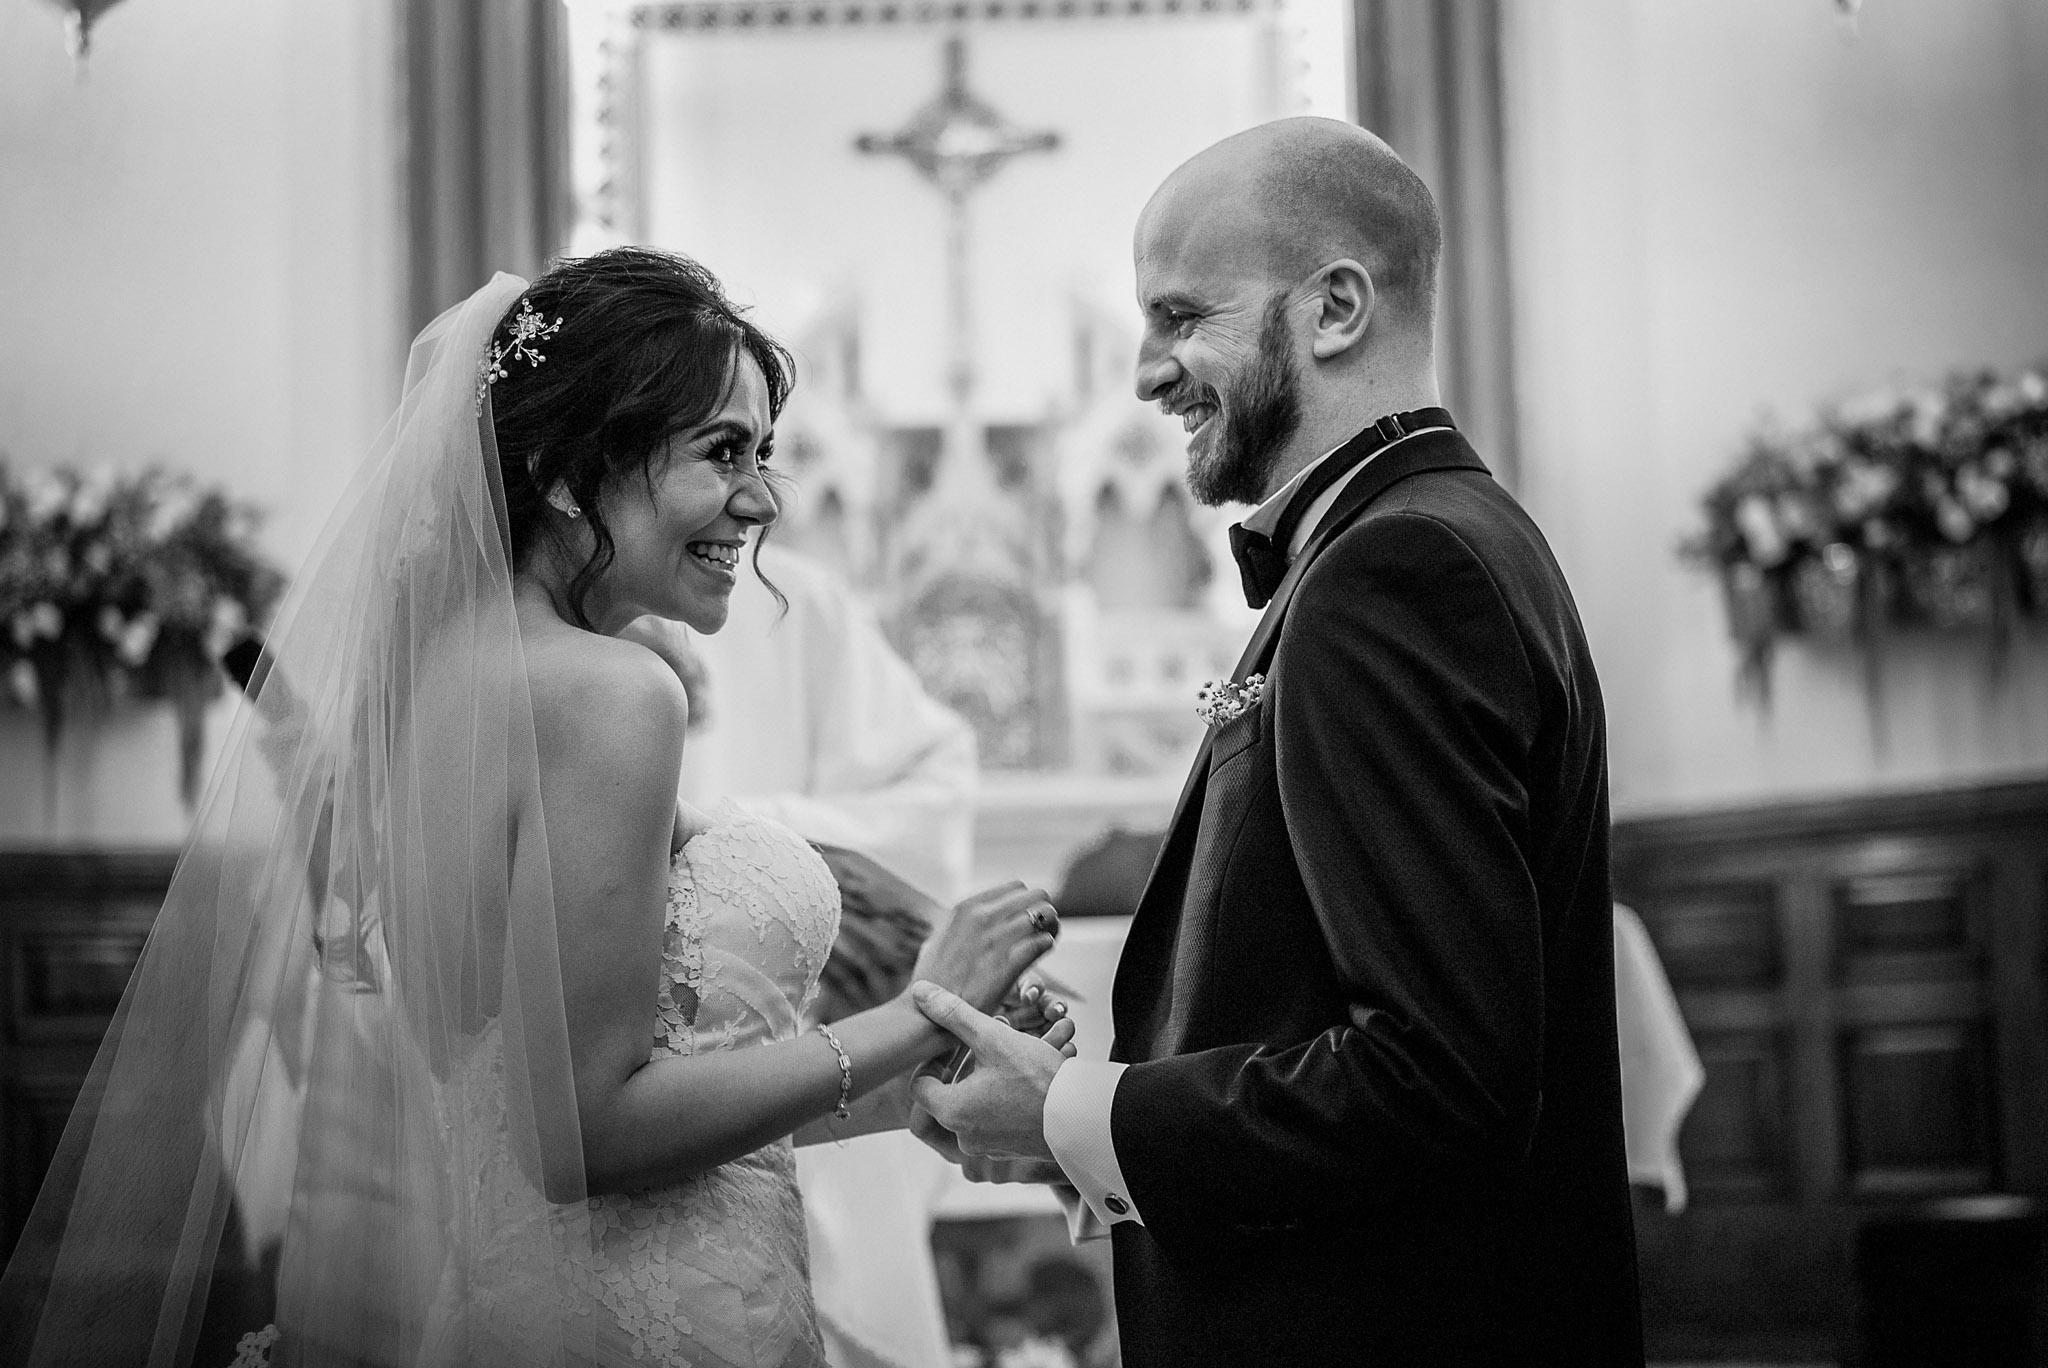 ©www.mauriziosolisbroca.com-20161001maurizio-solis-broca-mexico-canada-wedding-photographer20161001DSC07501-2-Edit.jpg